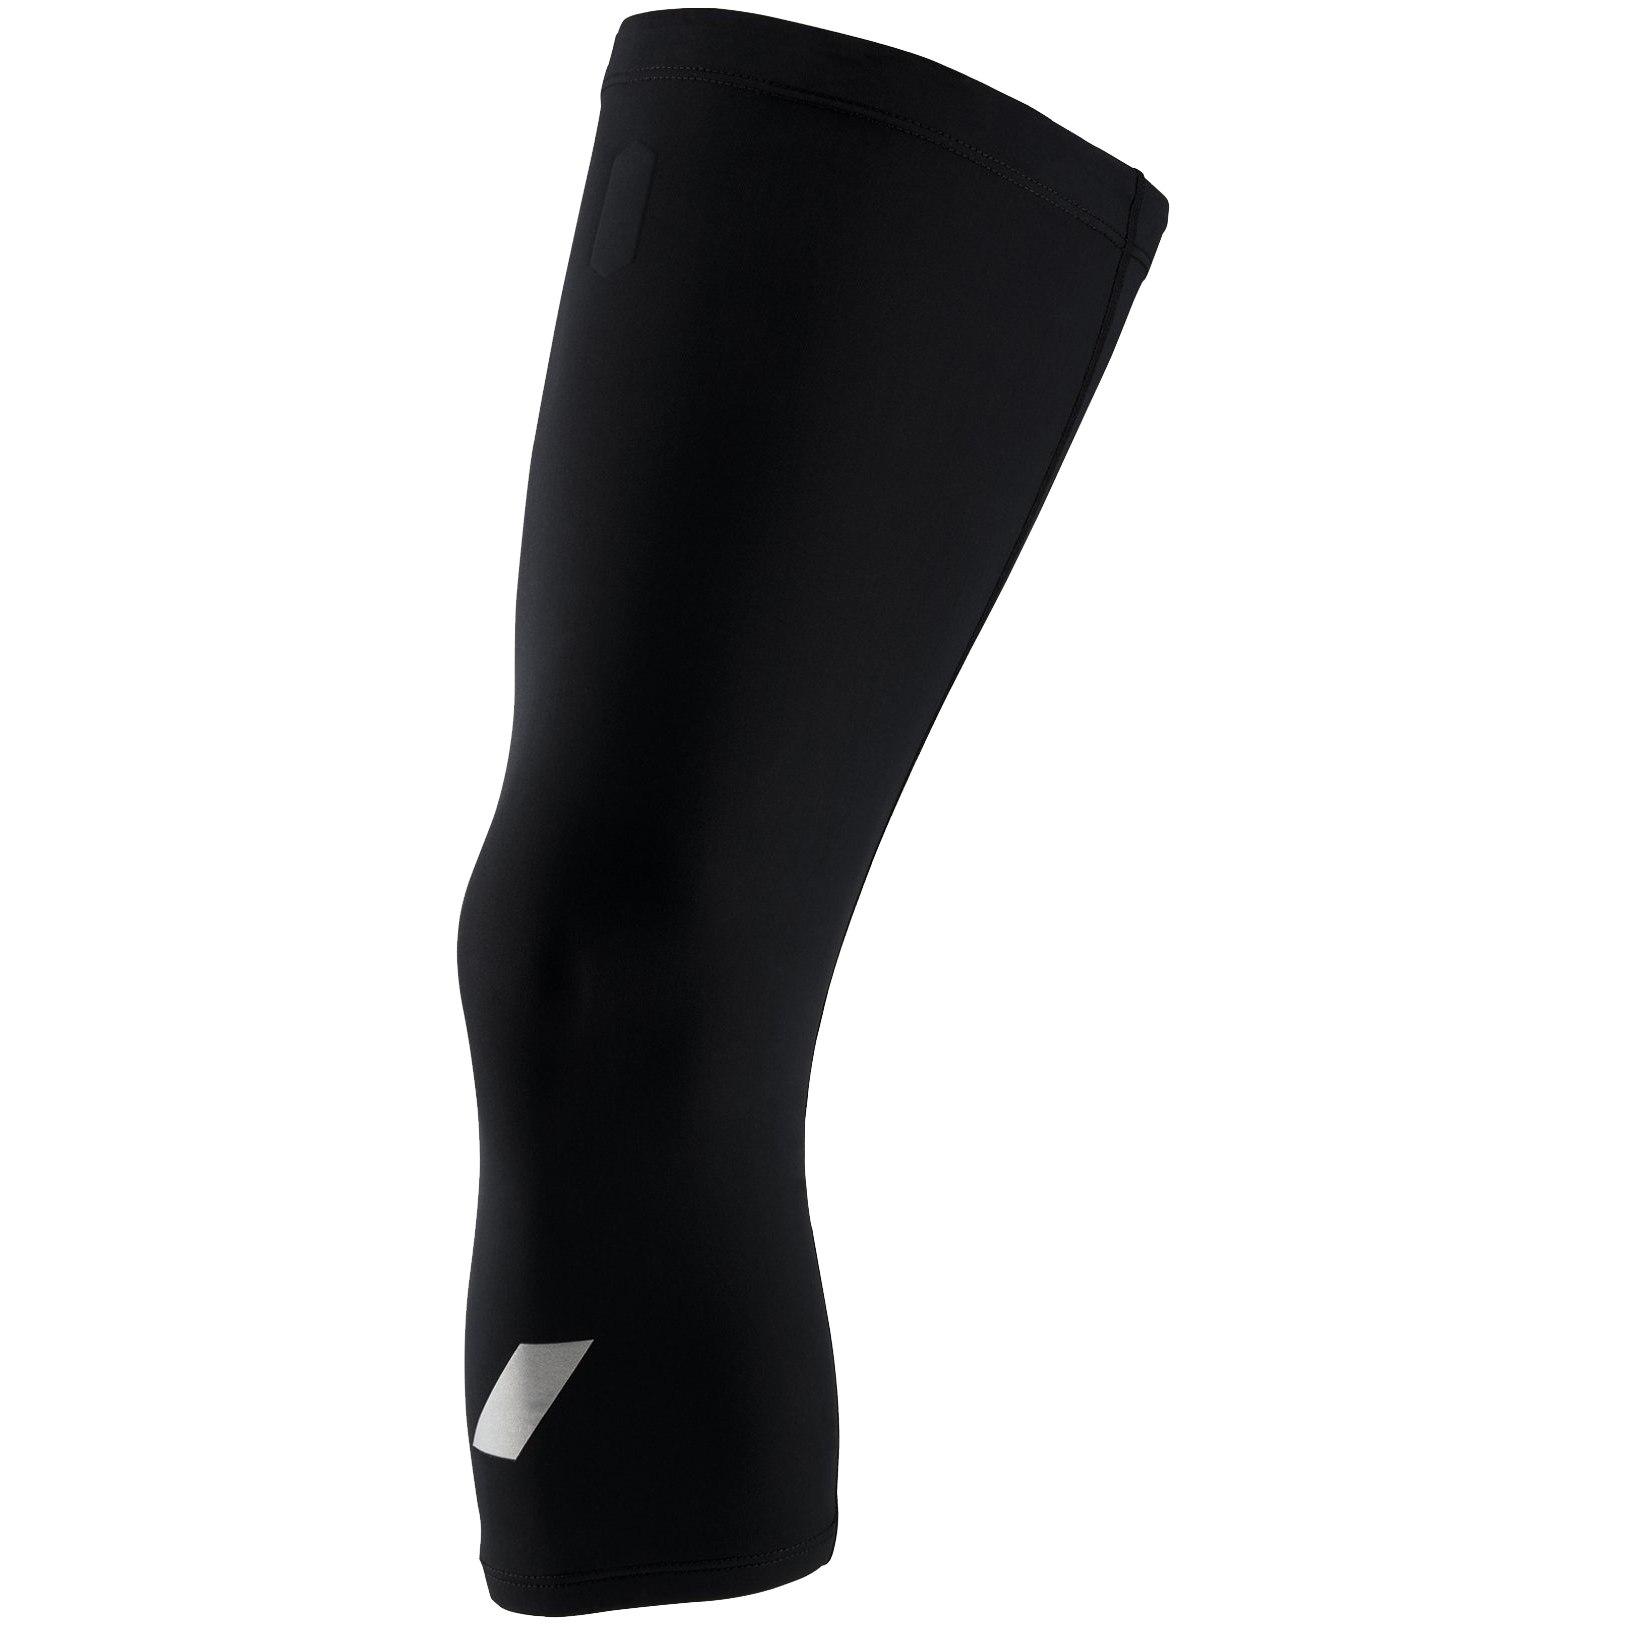 100% Exceeda Knee Sleeve - black